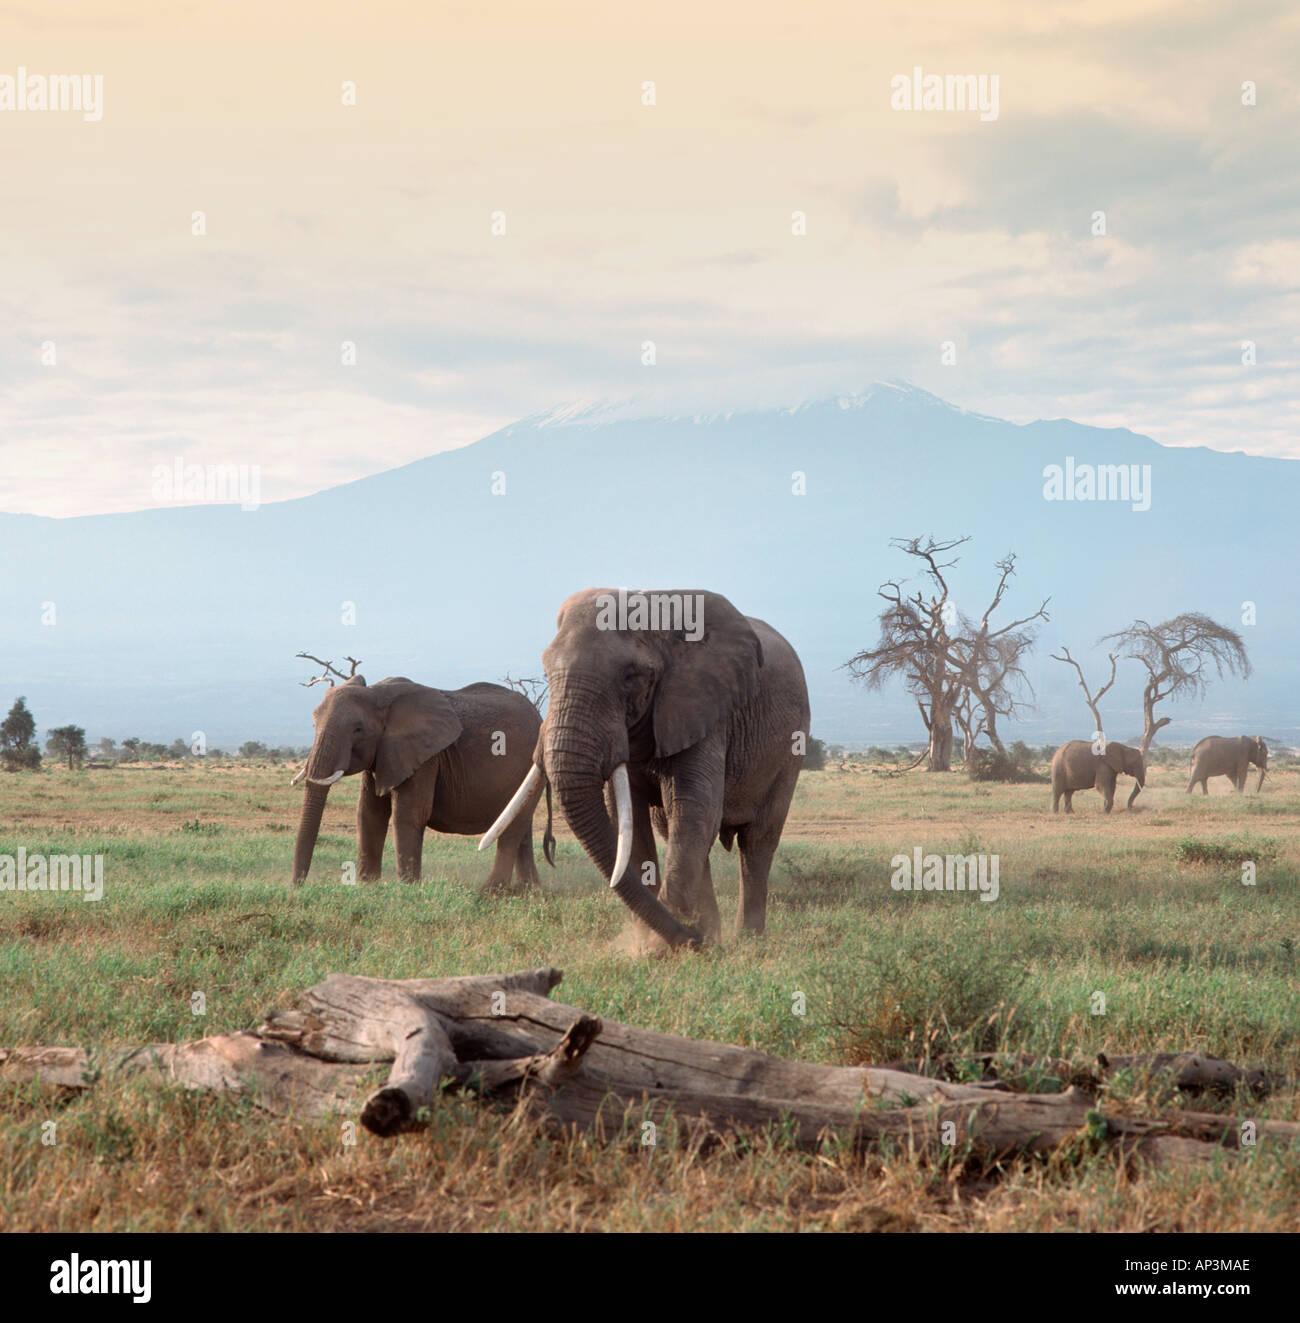 Elephants in front of Mount Kilimanjaro, Amboseli National Park, Kenya, East Africa - Stock Image